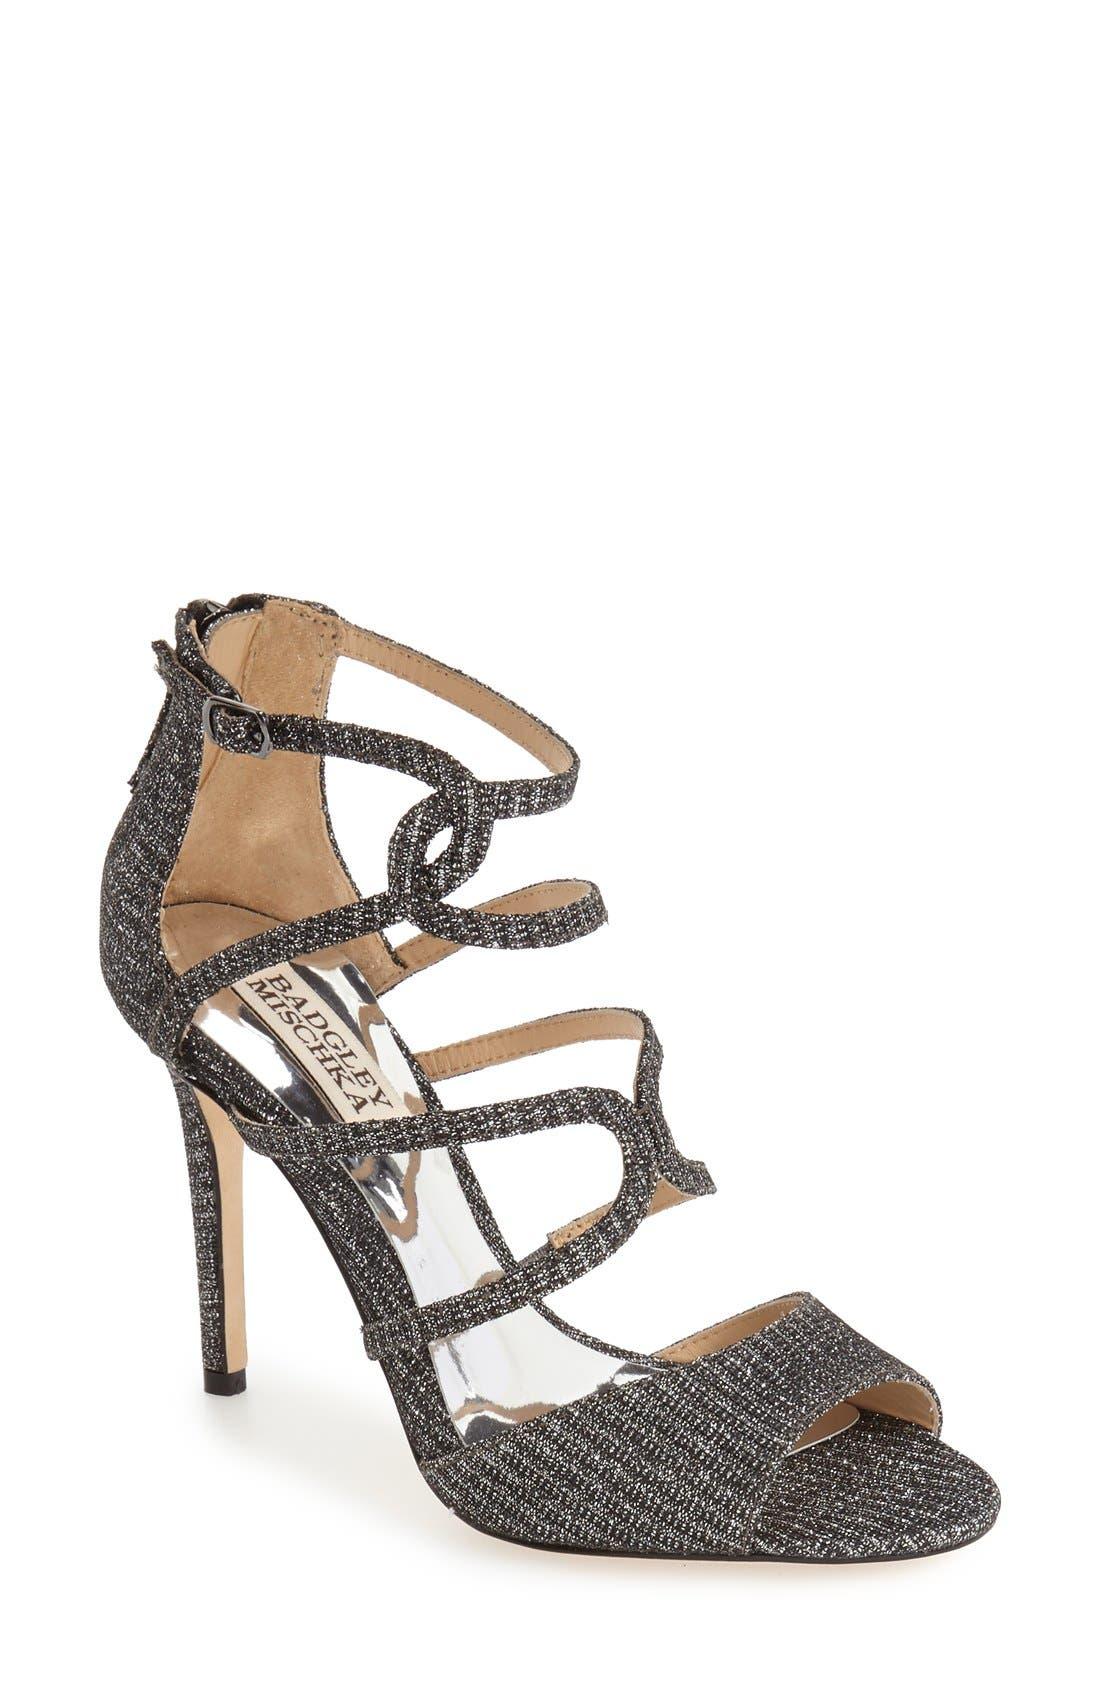 Alternate Image 1 Selected - Badgley Mischka 'Devon' Strappy Sandal (Women)